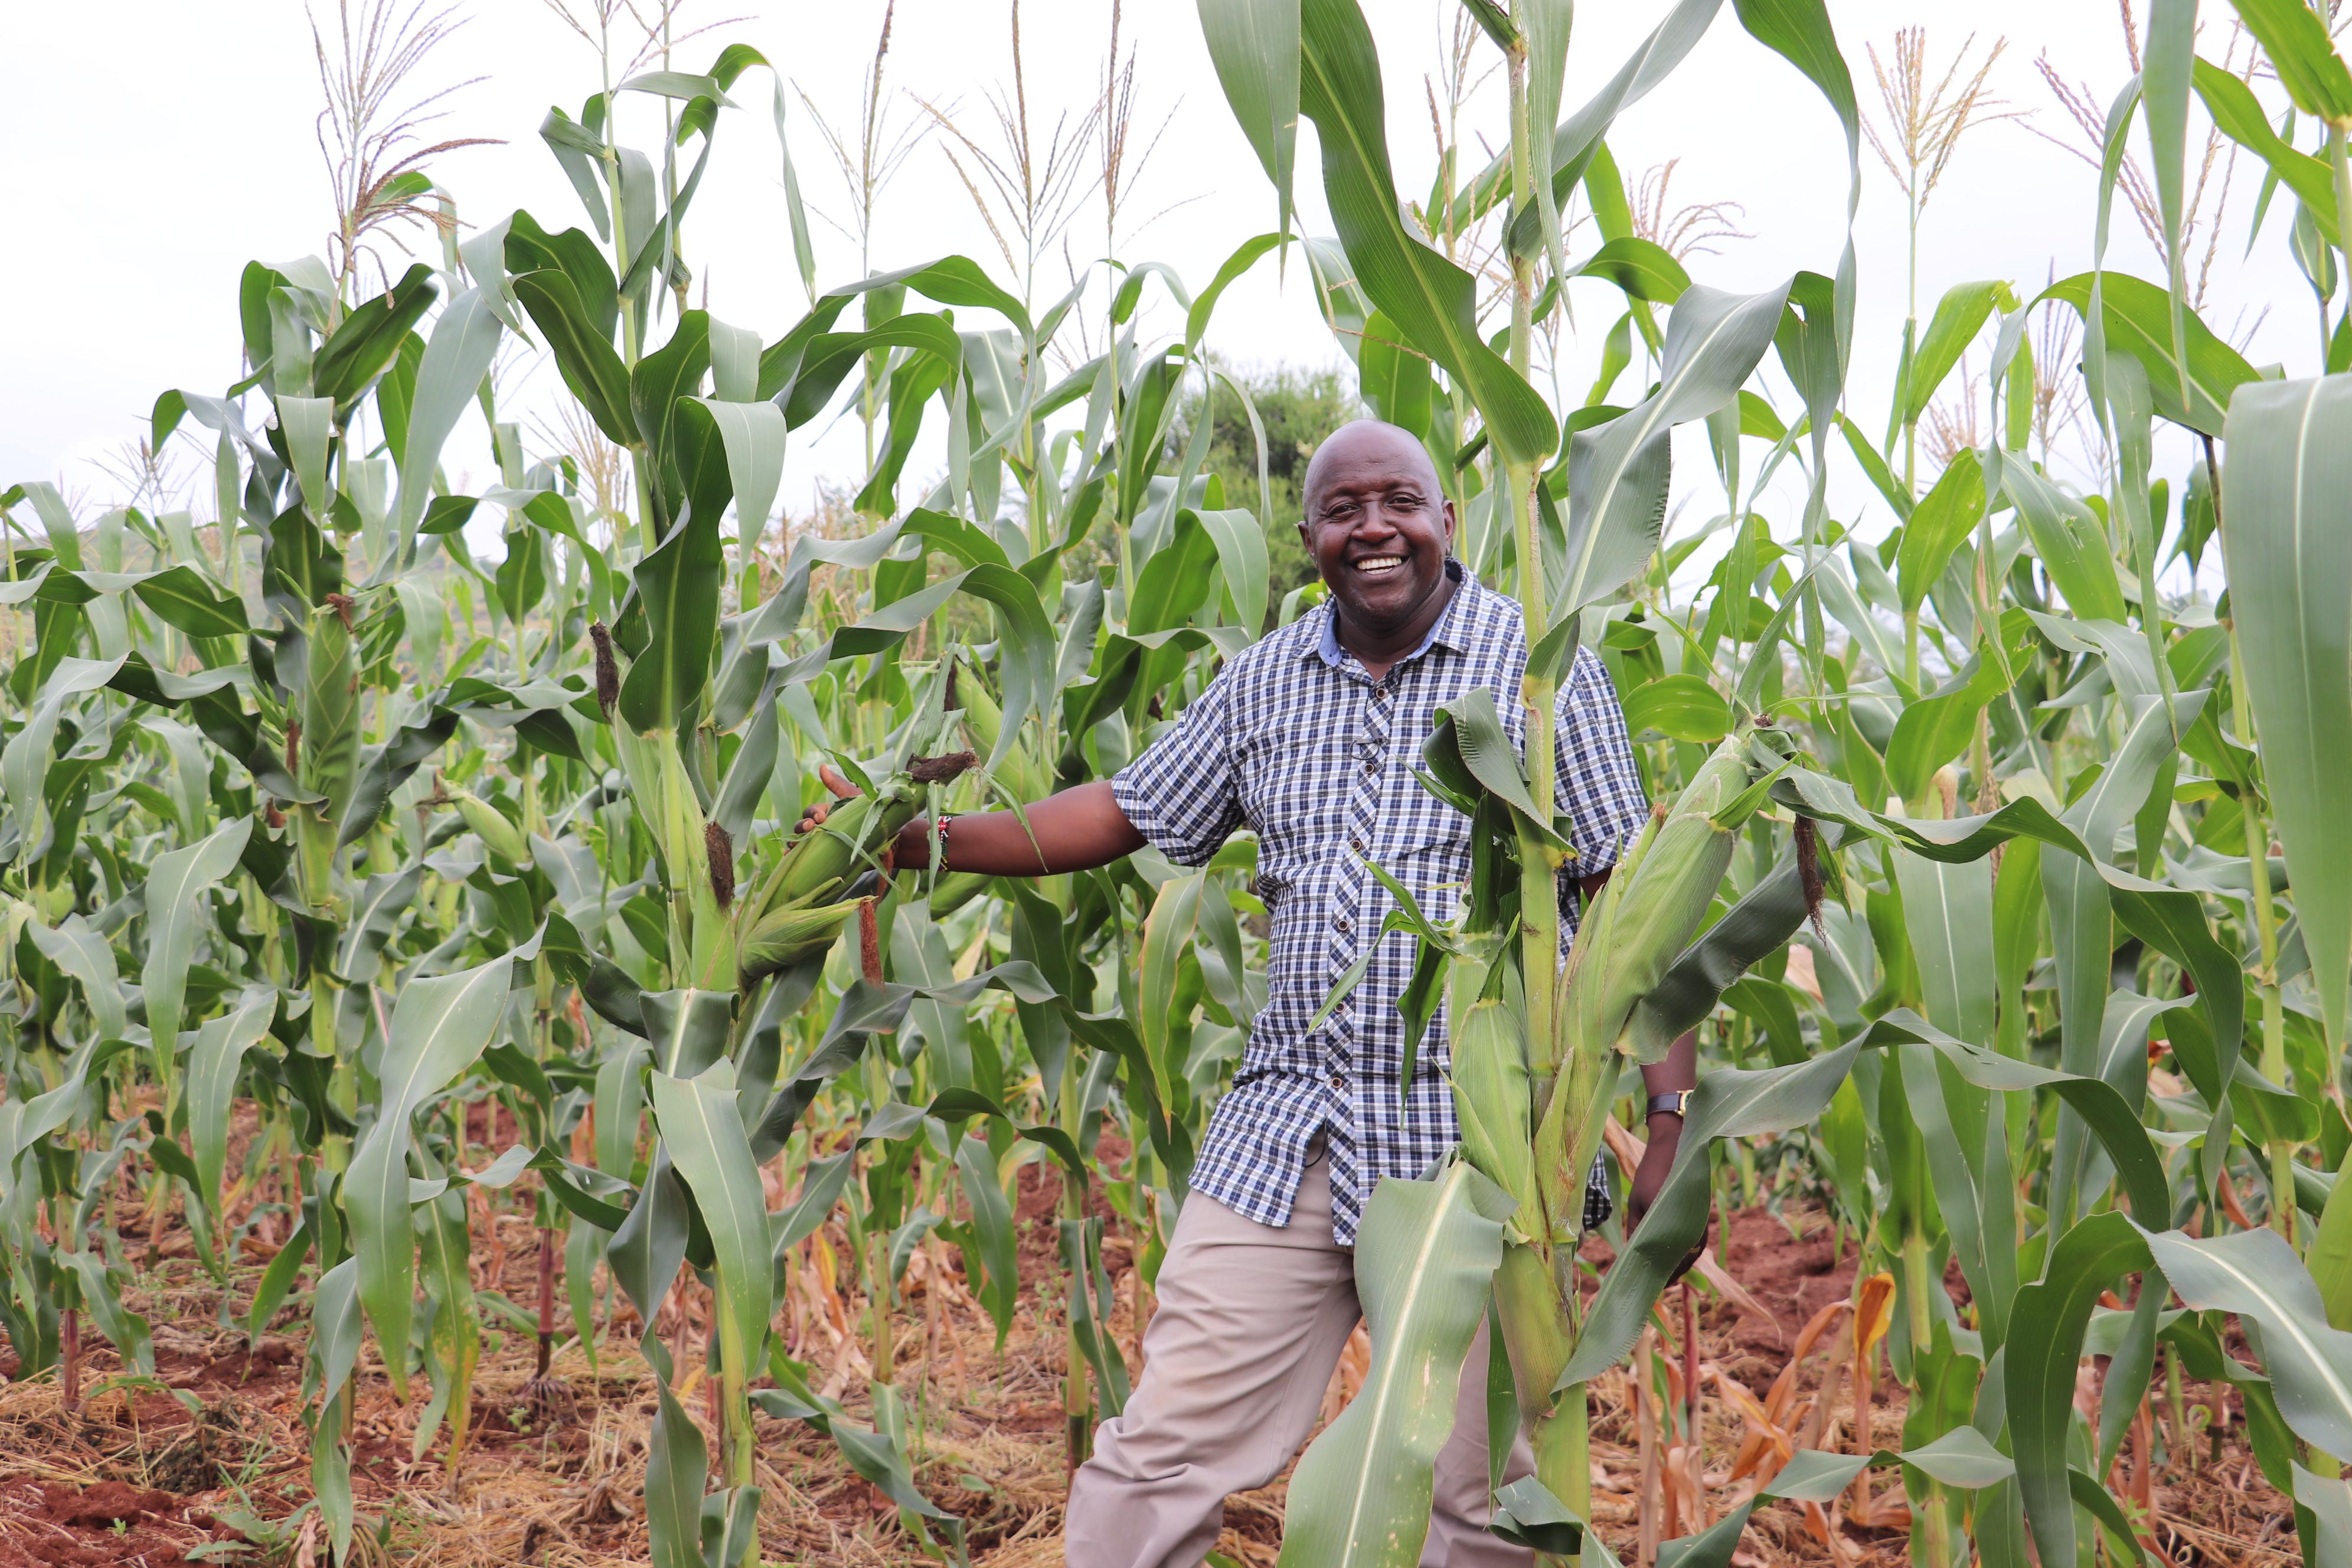 Kenya's Dryland Farmers Embrace Regenerative Farming to Brave Tough Climate